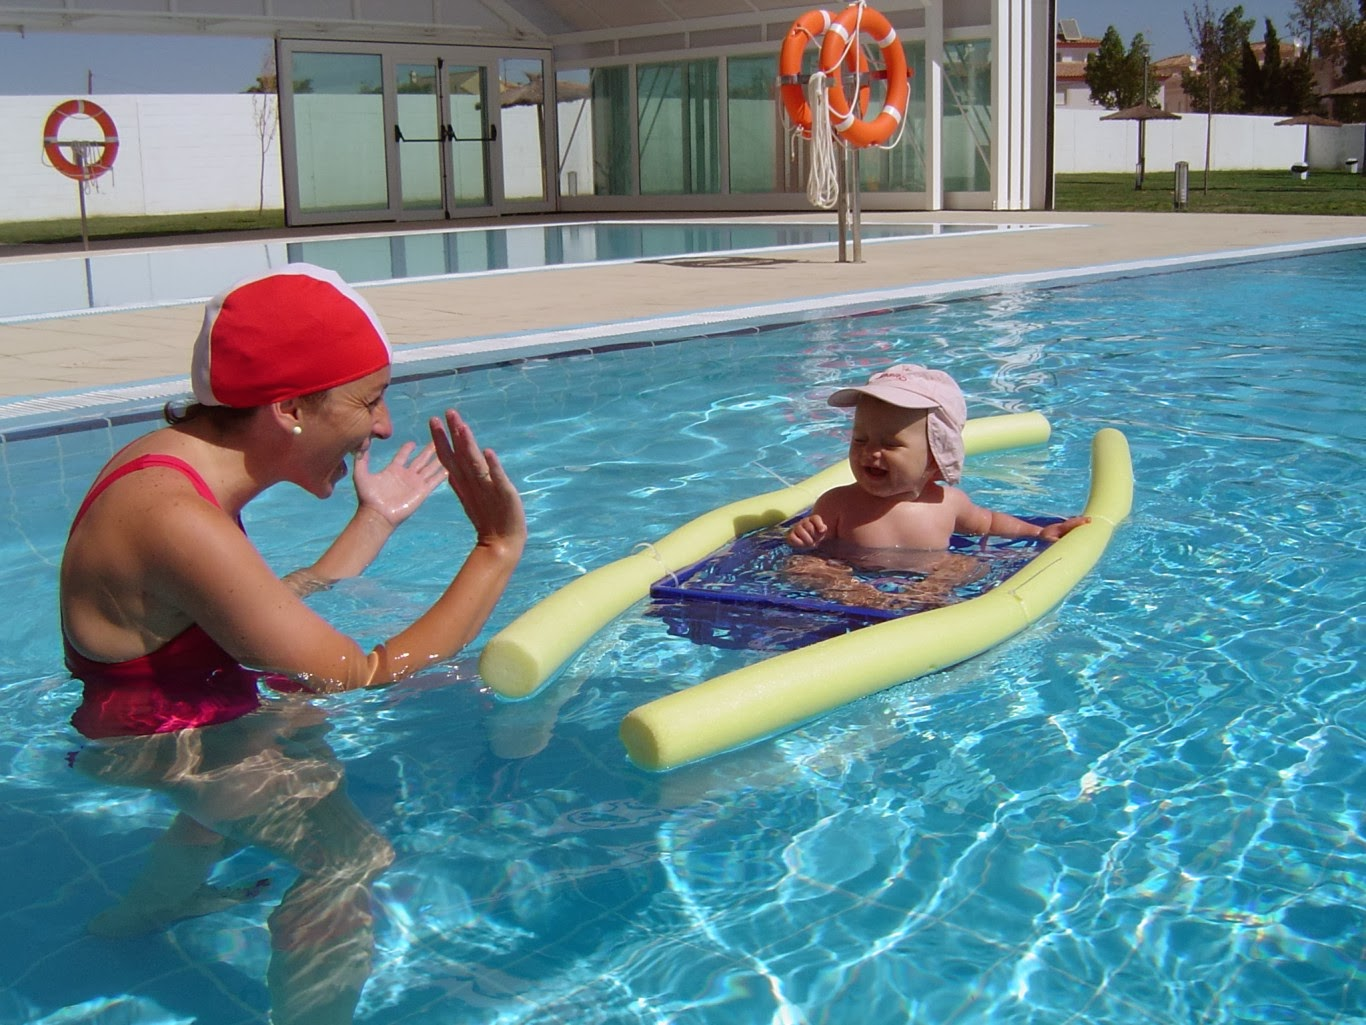 Nataci n recreativa corriendo por la vida for Piscina de natacion